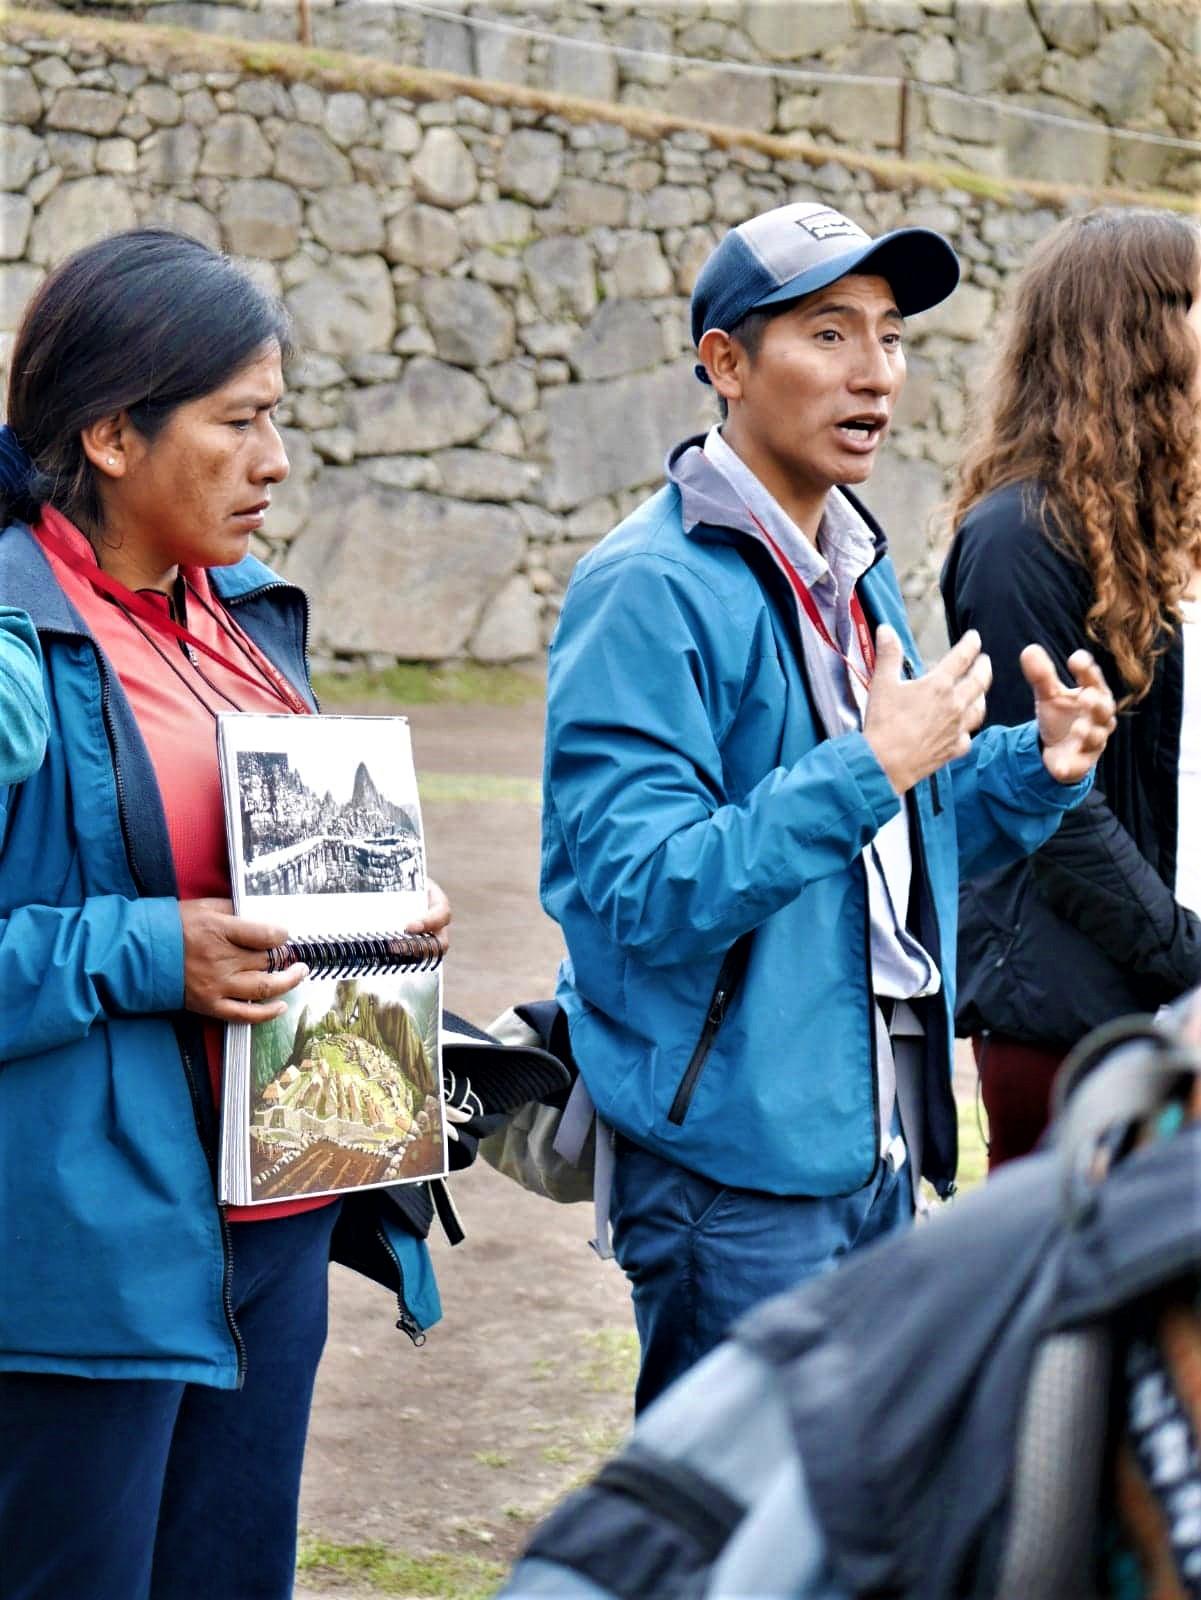 Machu Picchu 2-Day Tour by Train